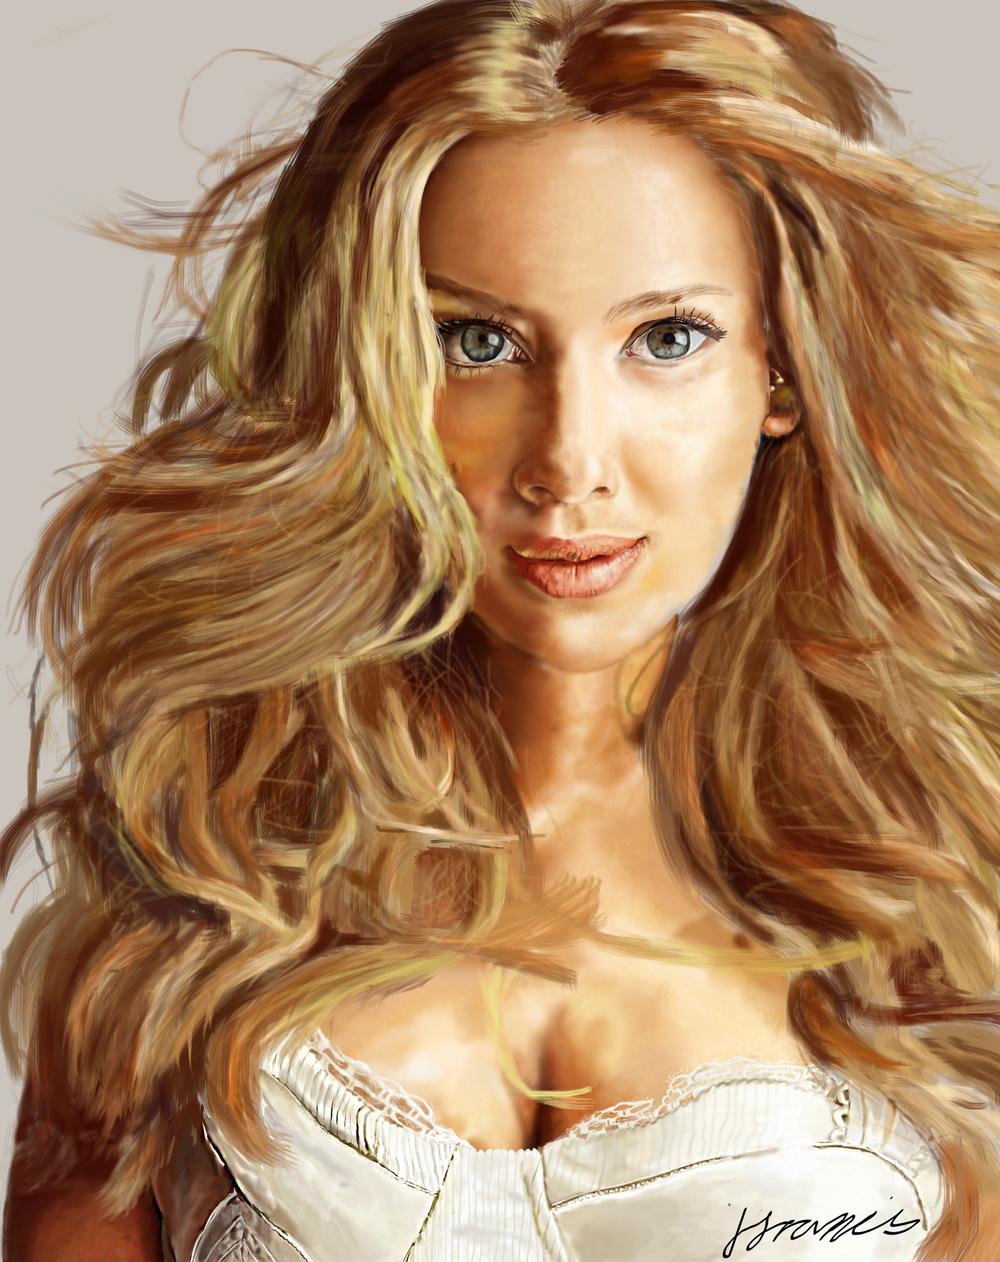 Digital painting of Scarlett Johansson done in photoshop.